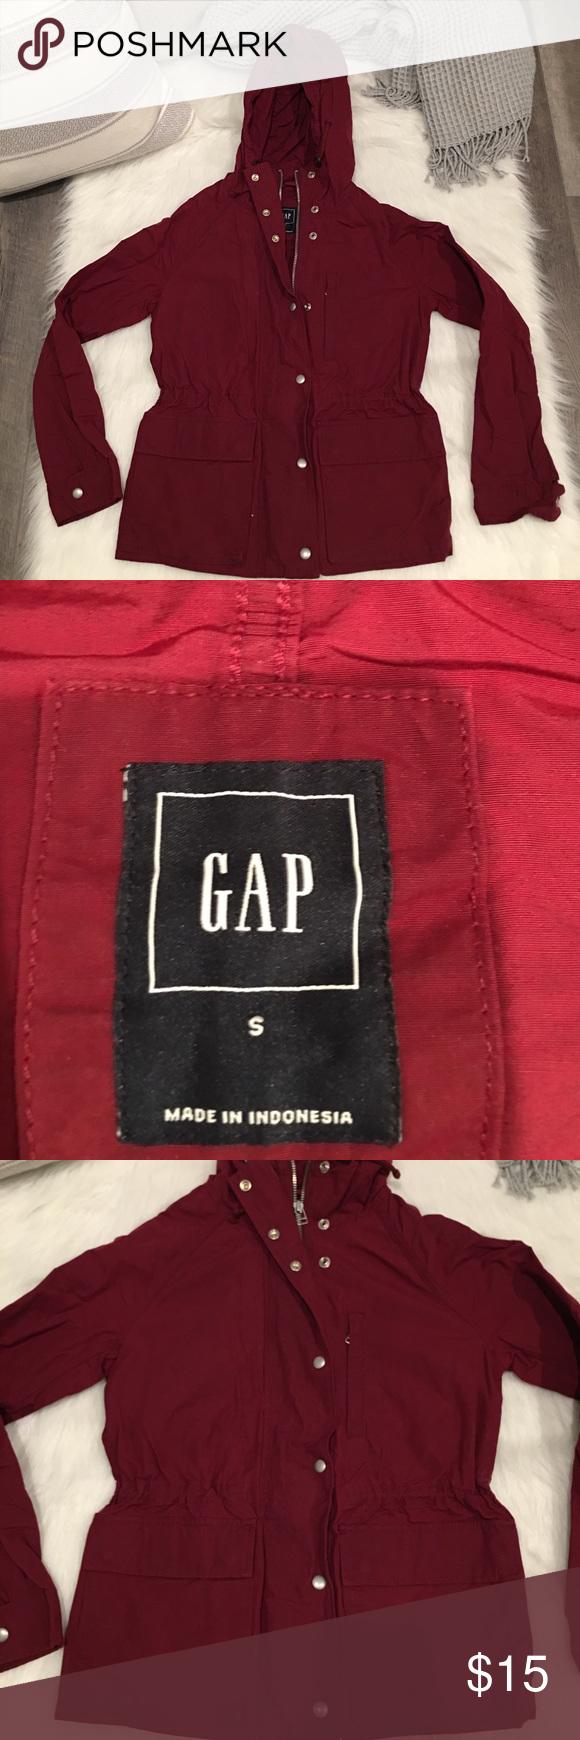 Gap Burgundy Utility Zip Up Hooded Jacket Coat Gap Women S Small Burgundy Utility Zip Up Button Hooded Jacket Coat Condi Hooded Jacket Jackets Coats Jackets [ 1740 x 580 Pixel ]